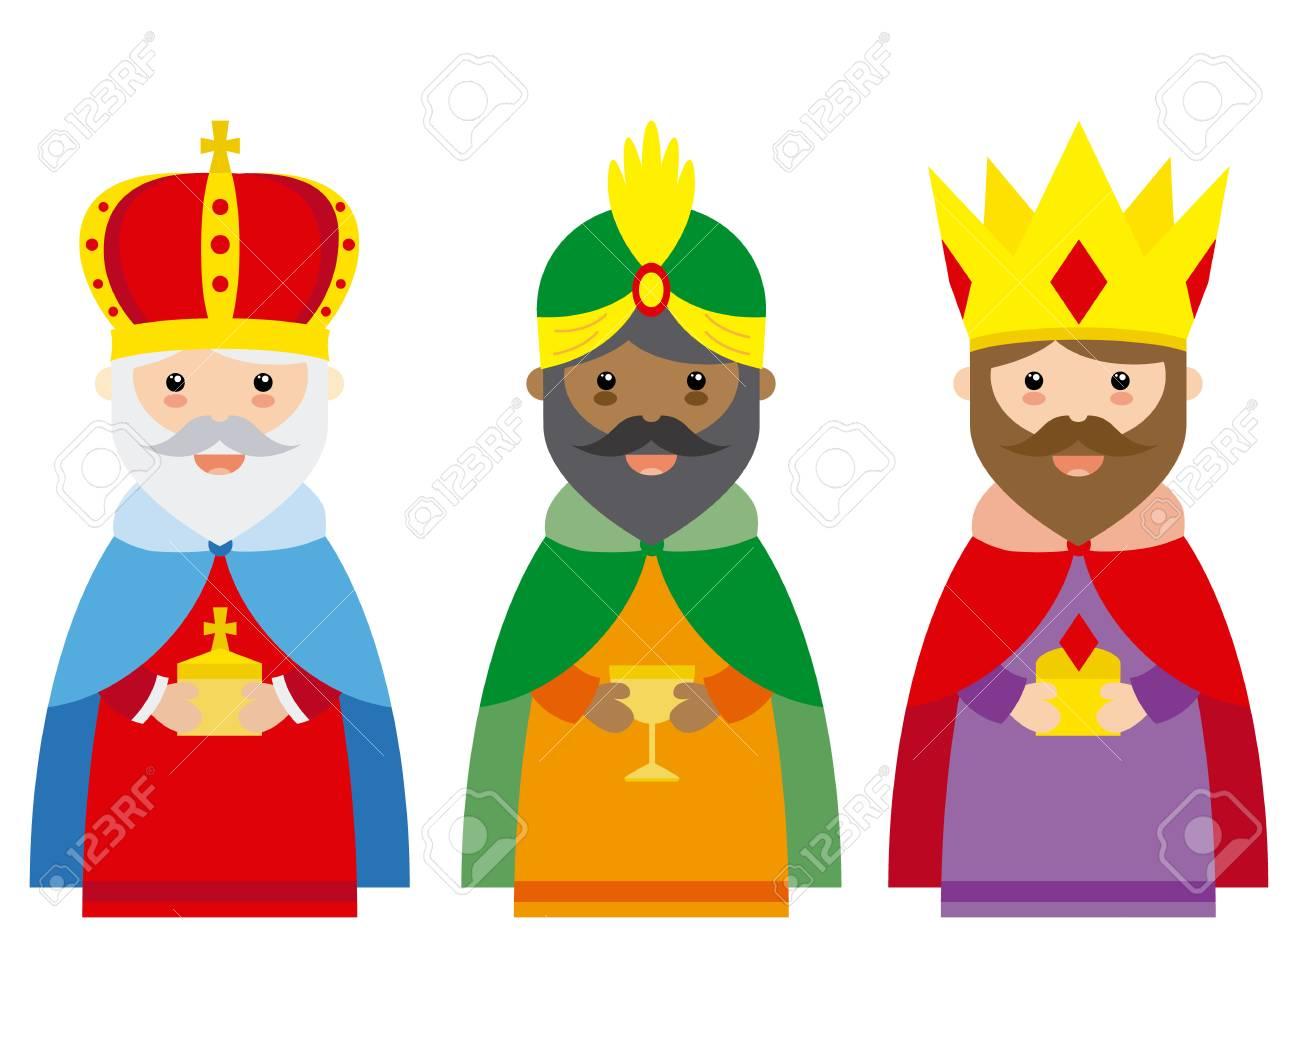 The three wise men of orient.